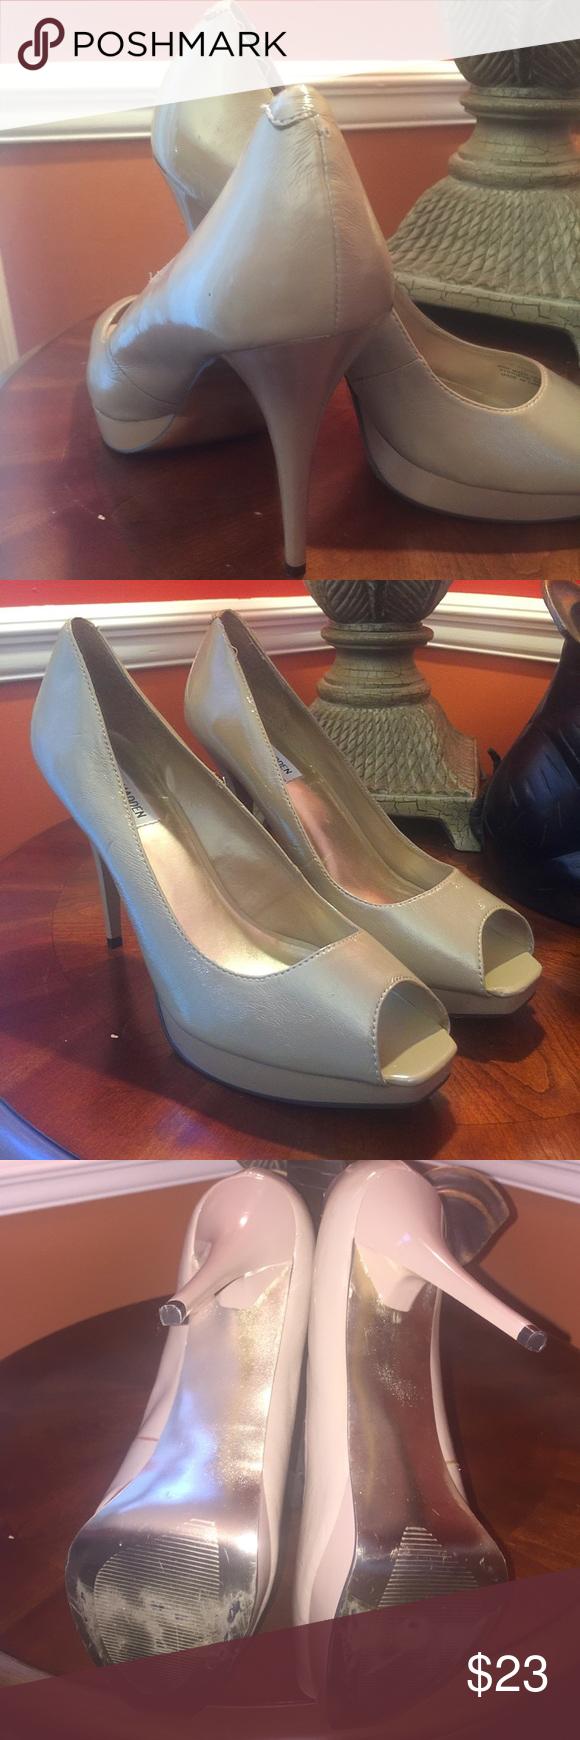 Shoes Steve Madden peep toe platform patent leather pump. Steve Madden Shoes Heels